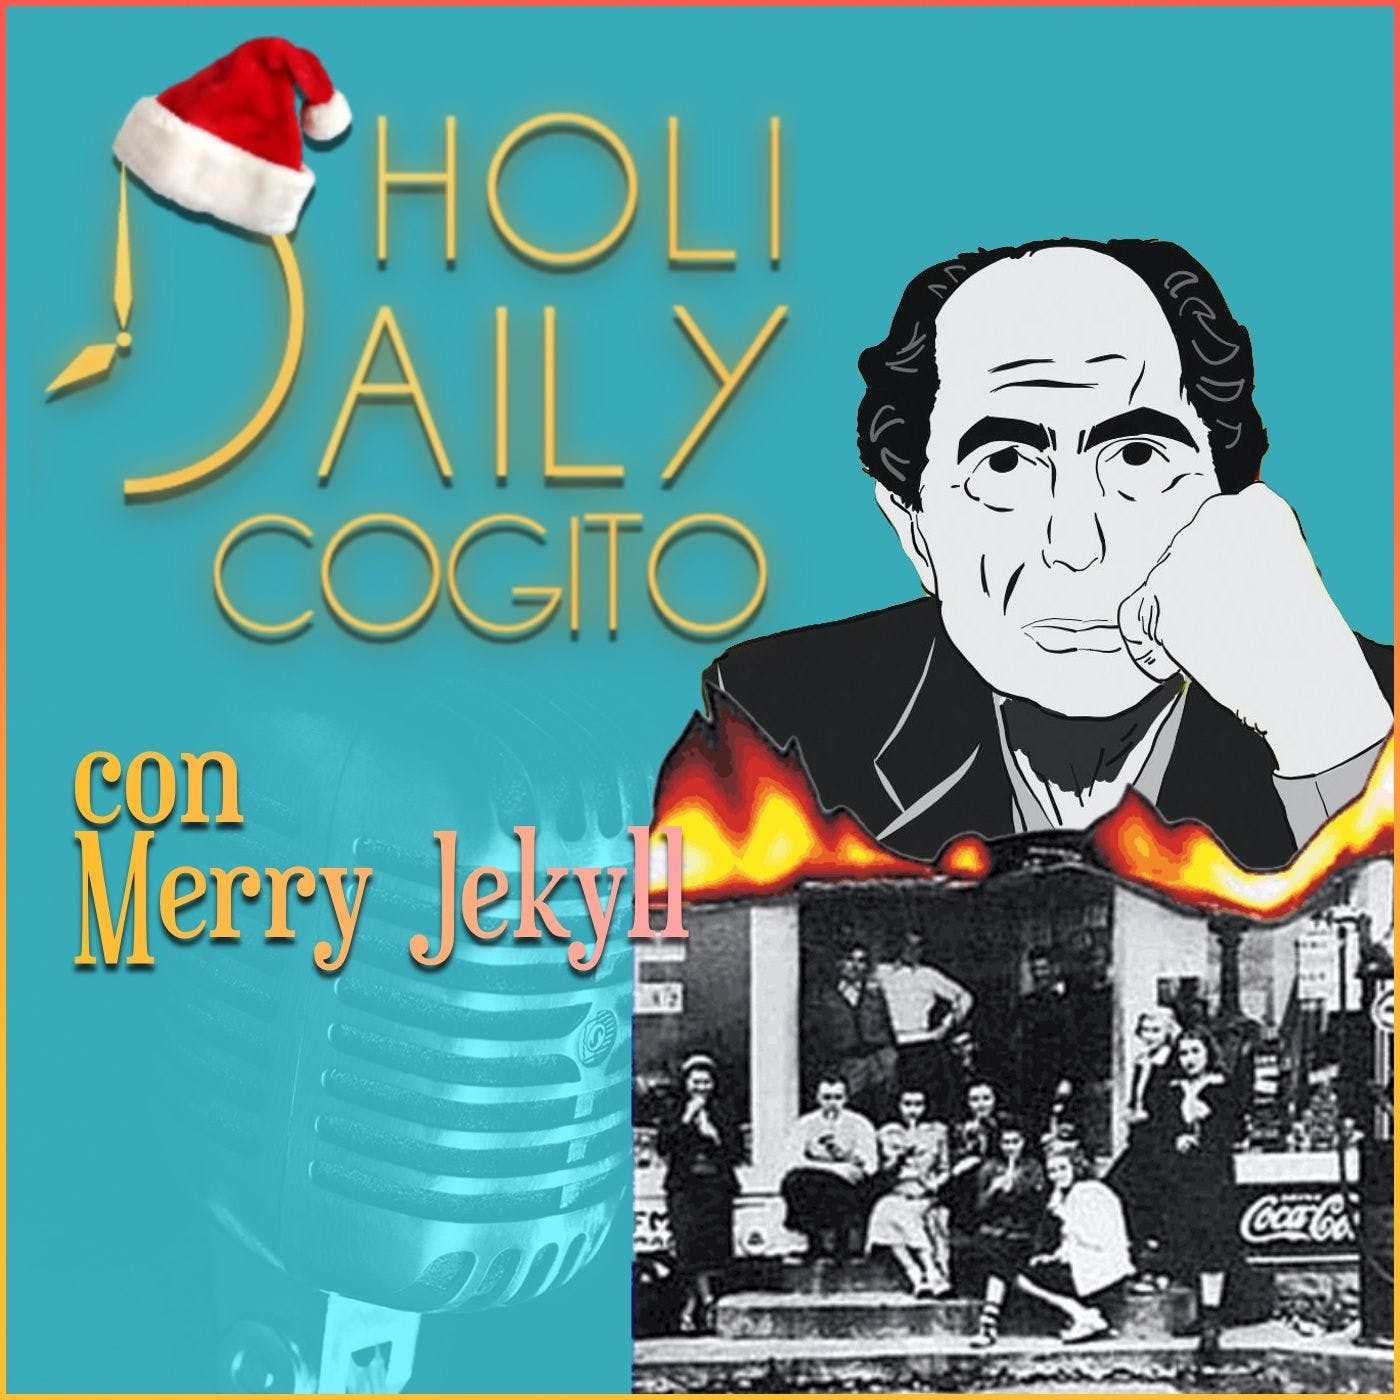 Pastorale Americana: essere vittime conviene - Merry Jekyll